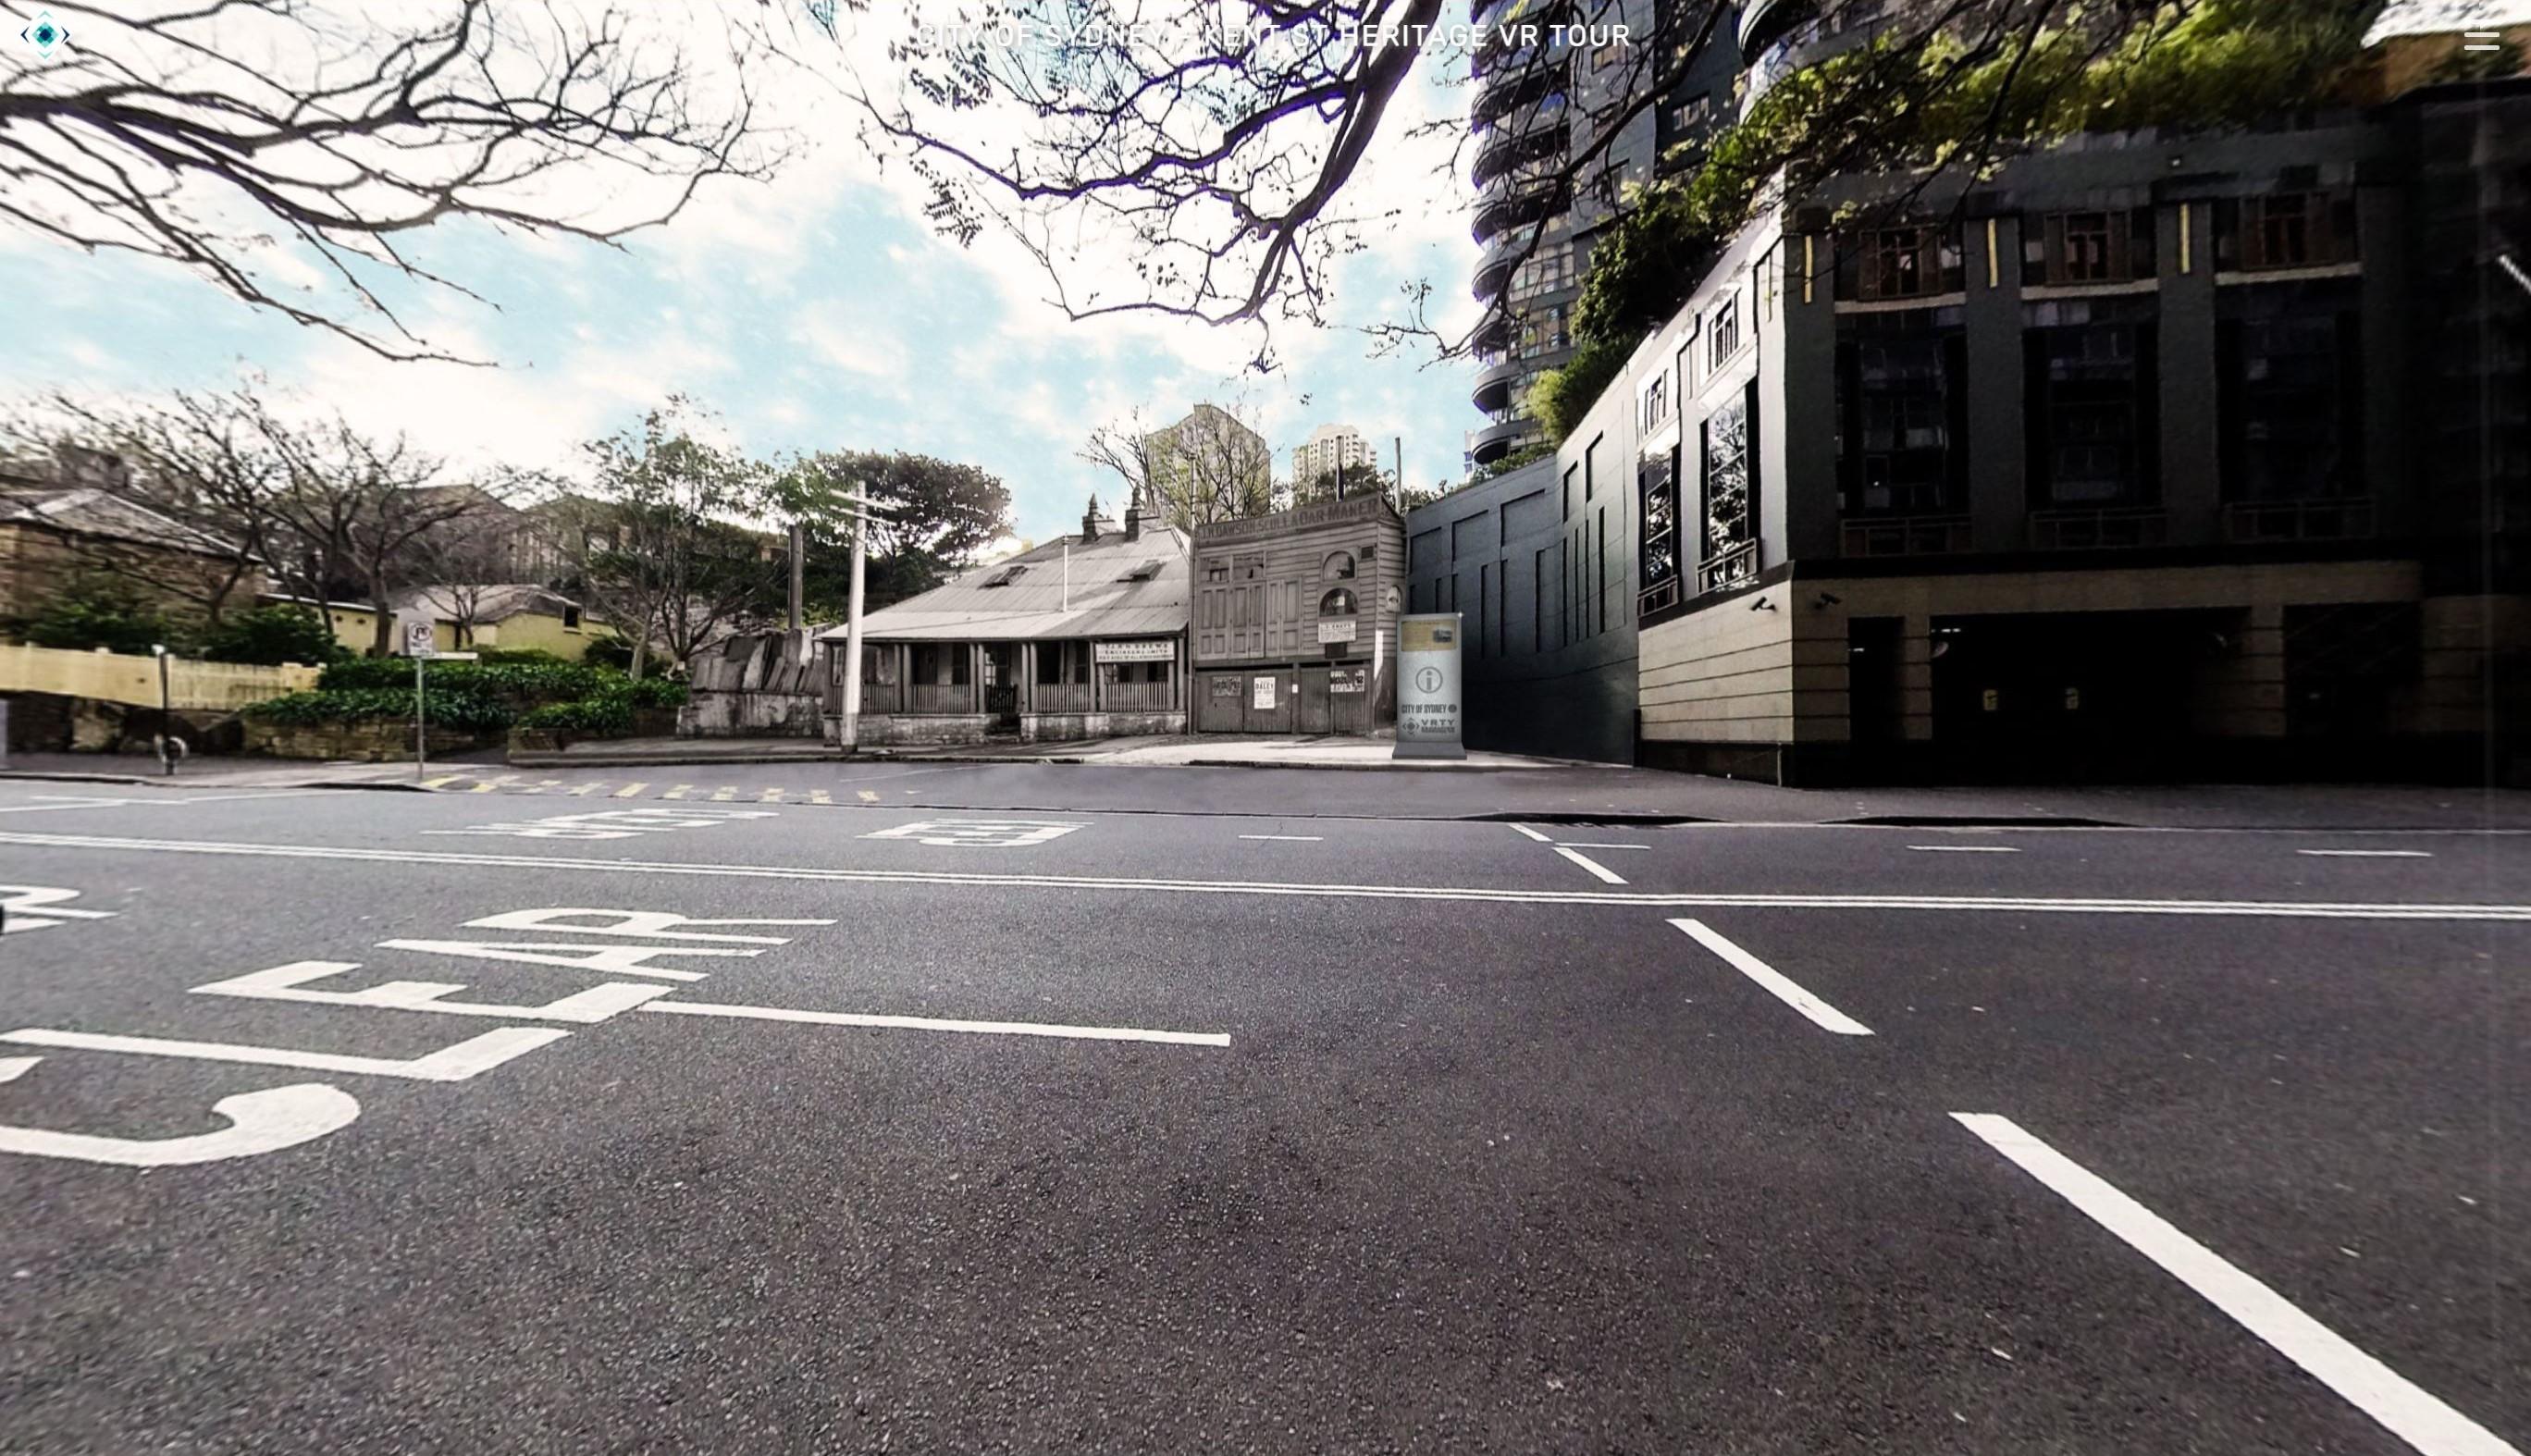 City of Sydney VR past